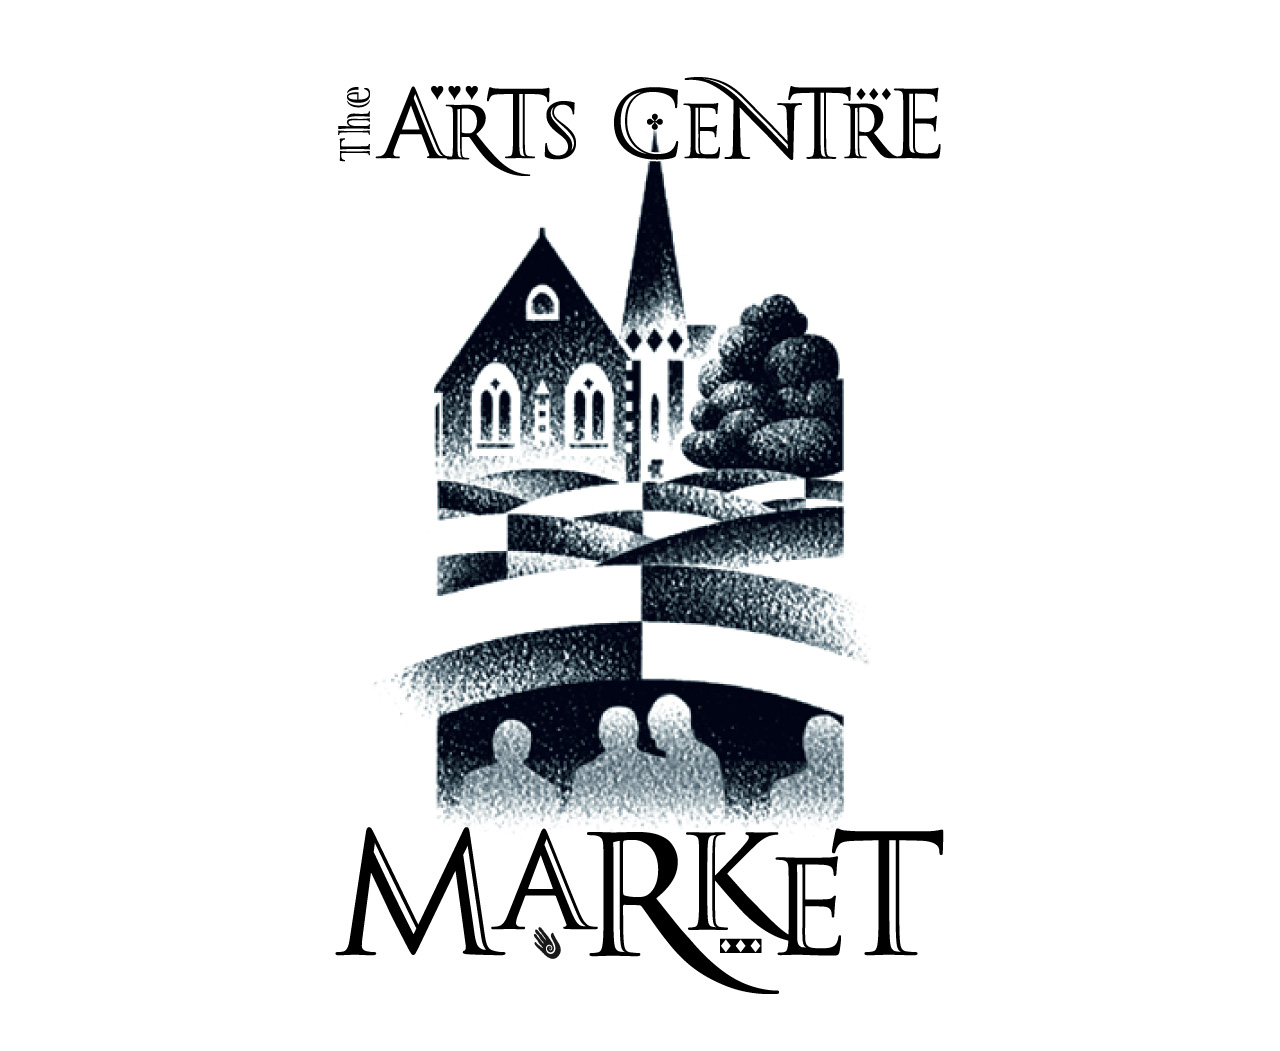 The Arts Centre Market logo